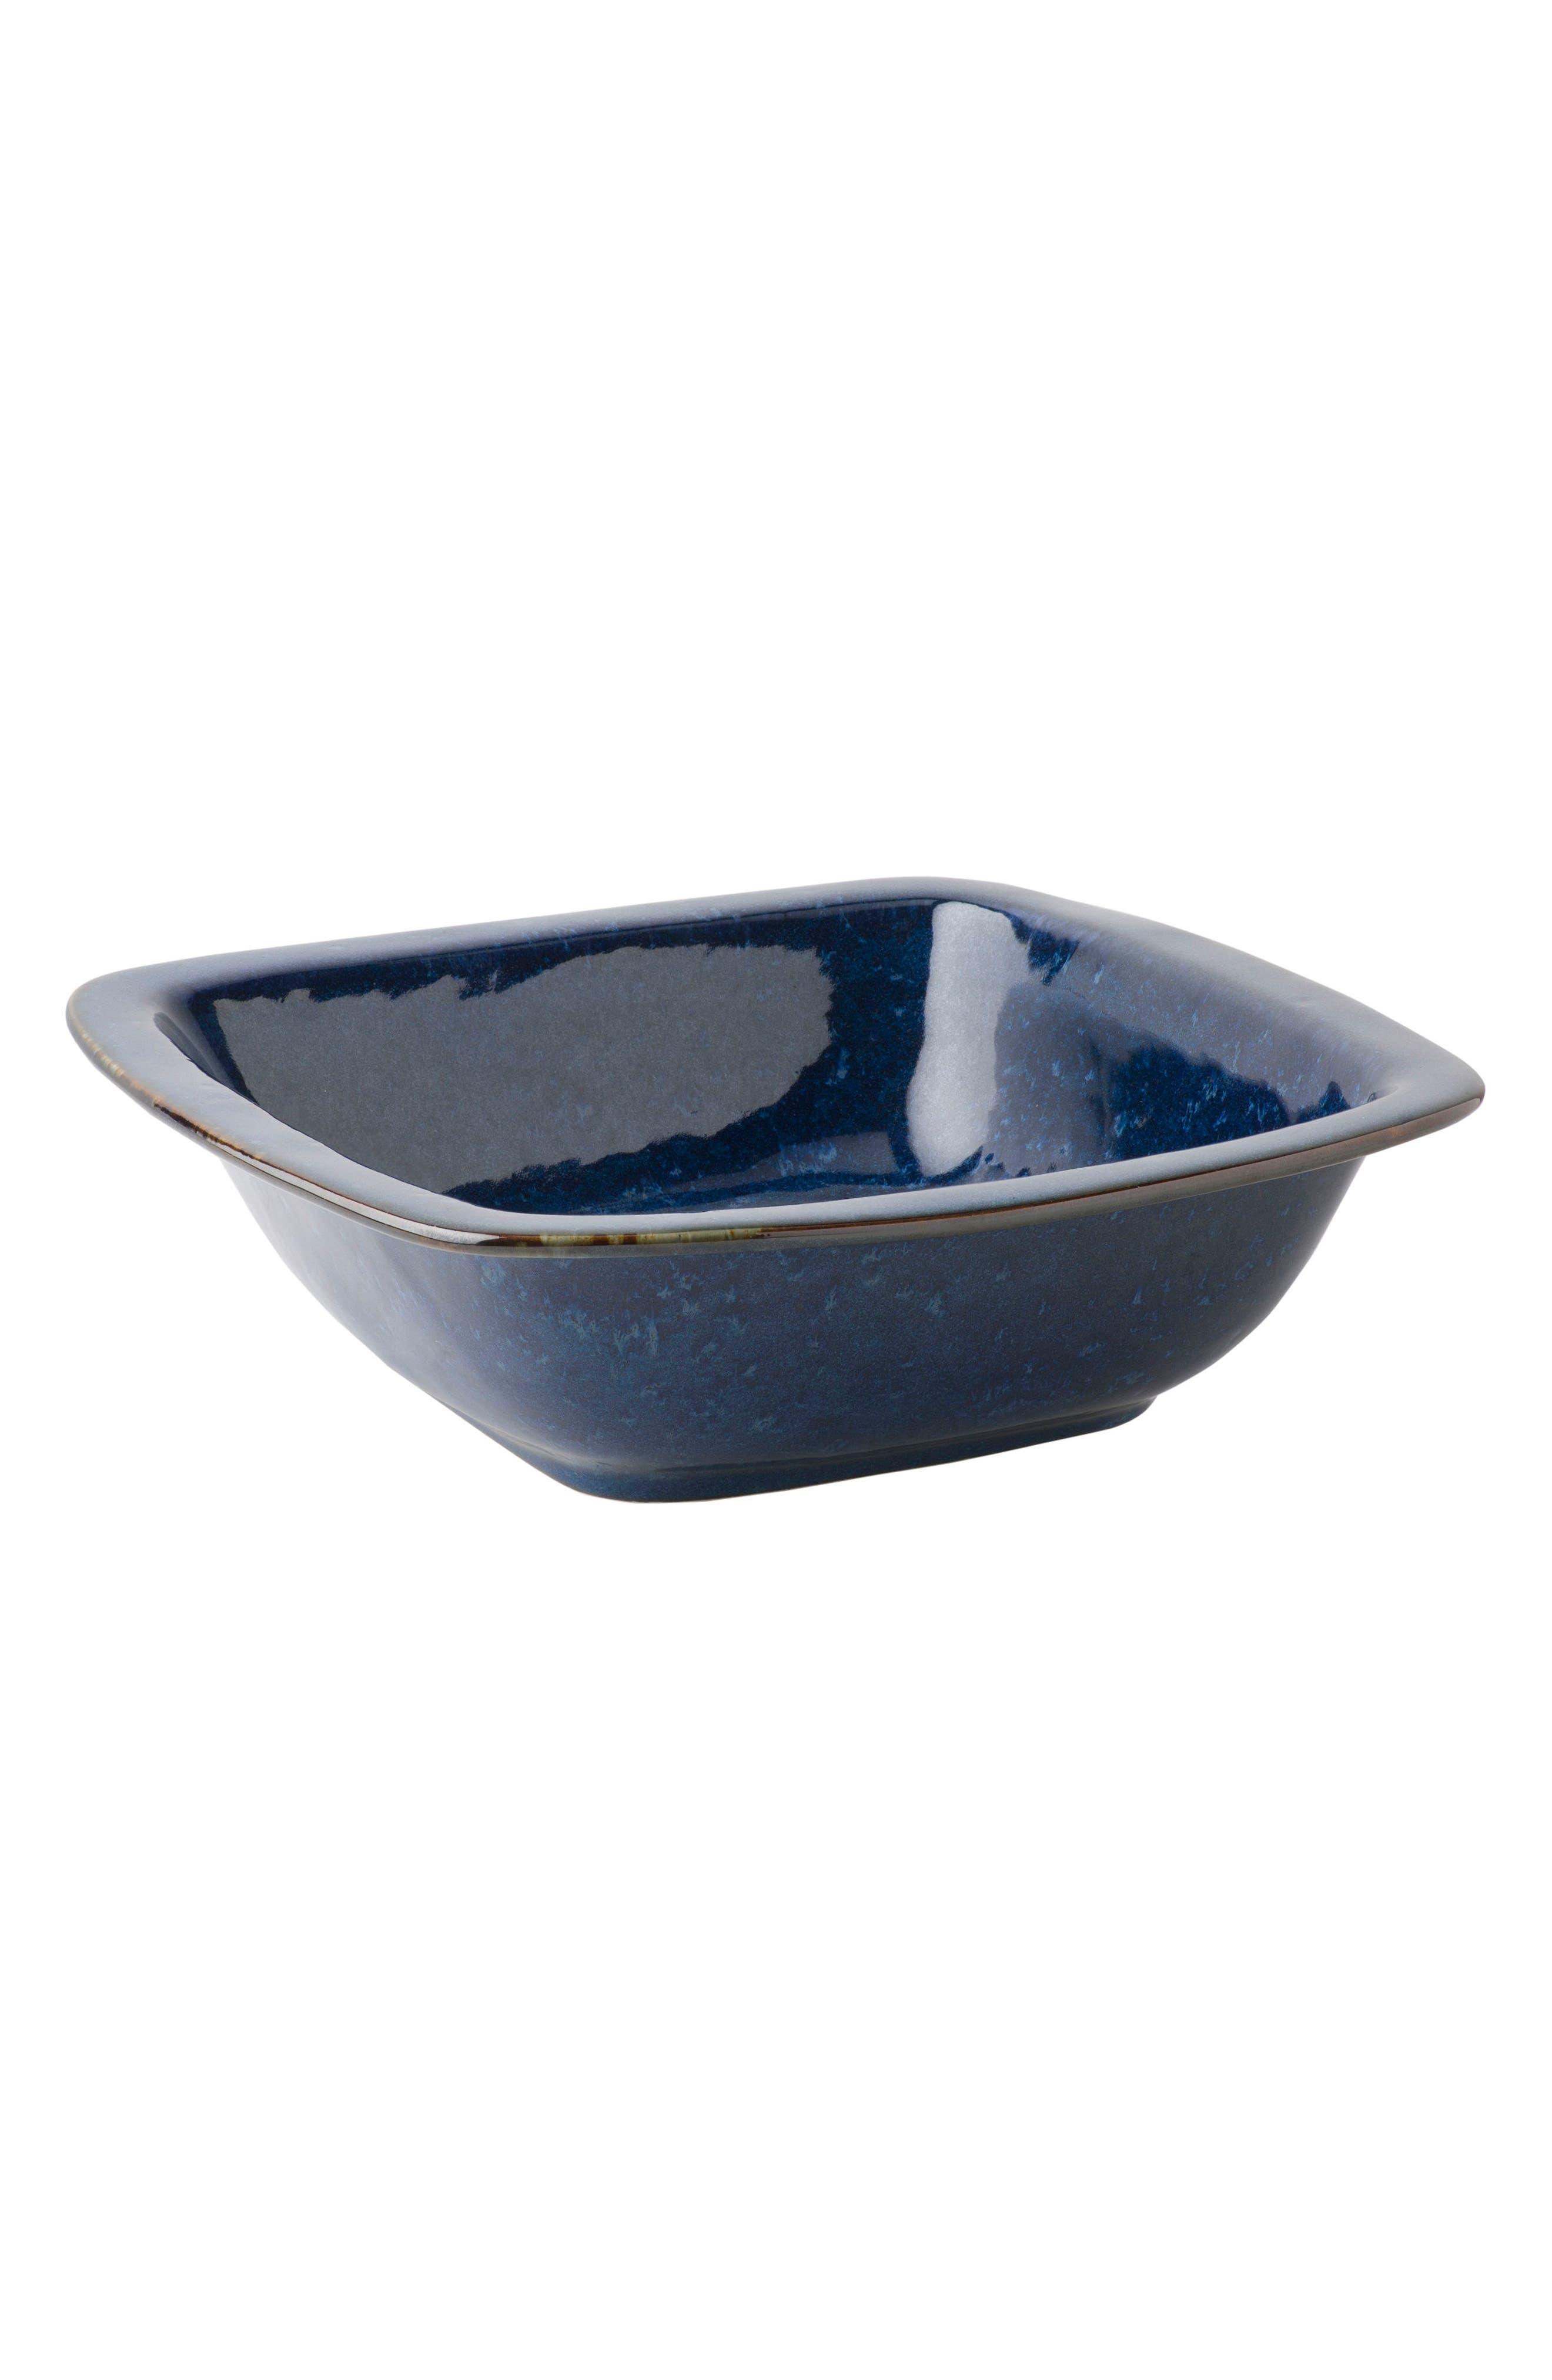 Alternate Image 1 Selected - Juliska Puro Serving Bowl